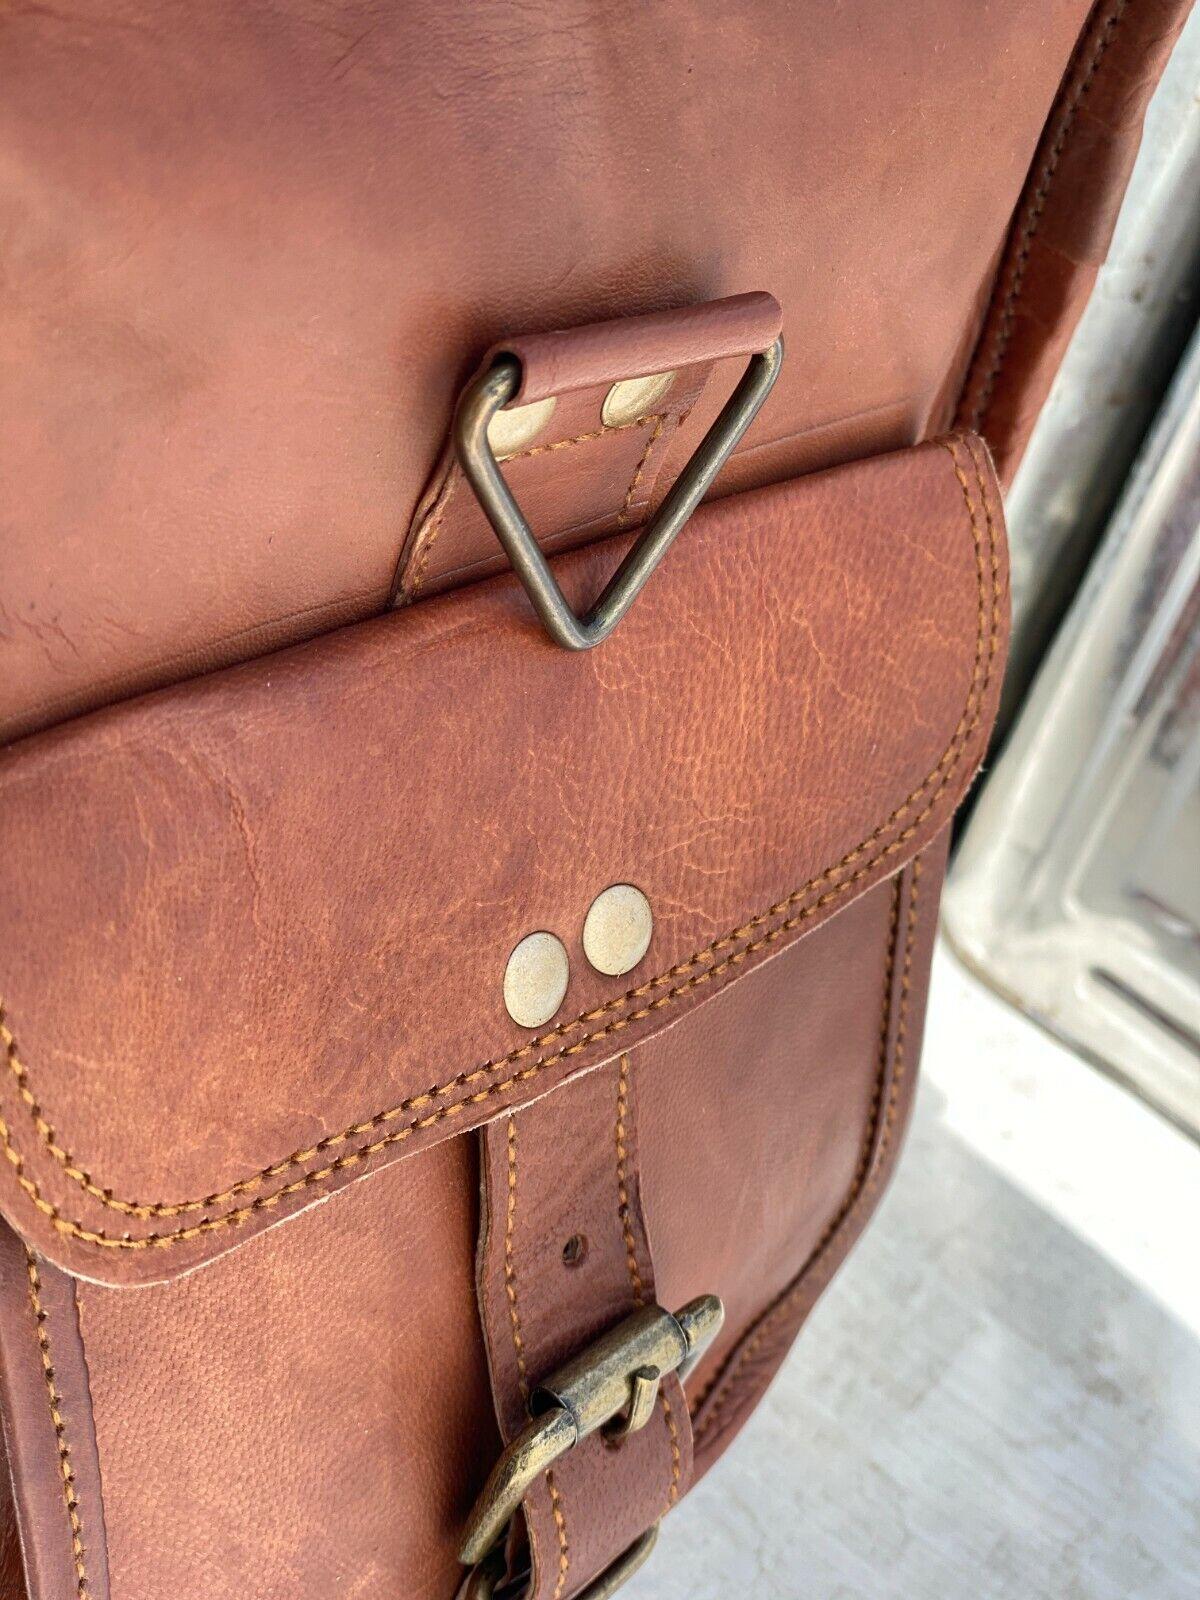 20 And 25 Leather Duffel Travel Gym Vintage Men Brown Luggage Weekend Bag Tote - $53.94